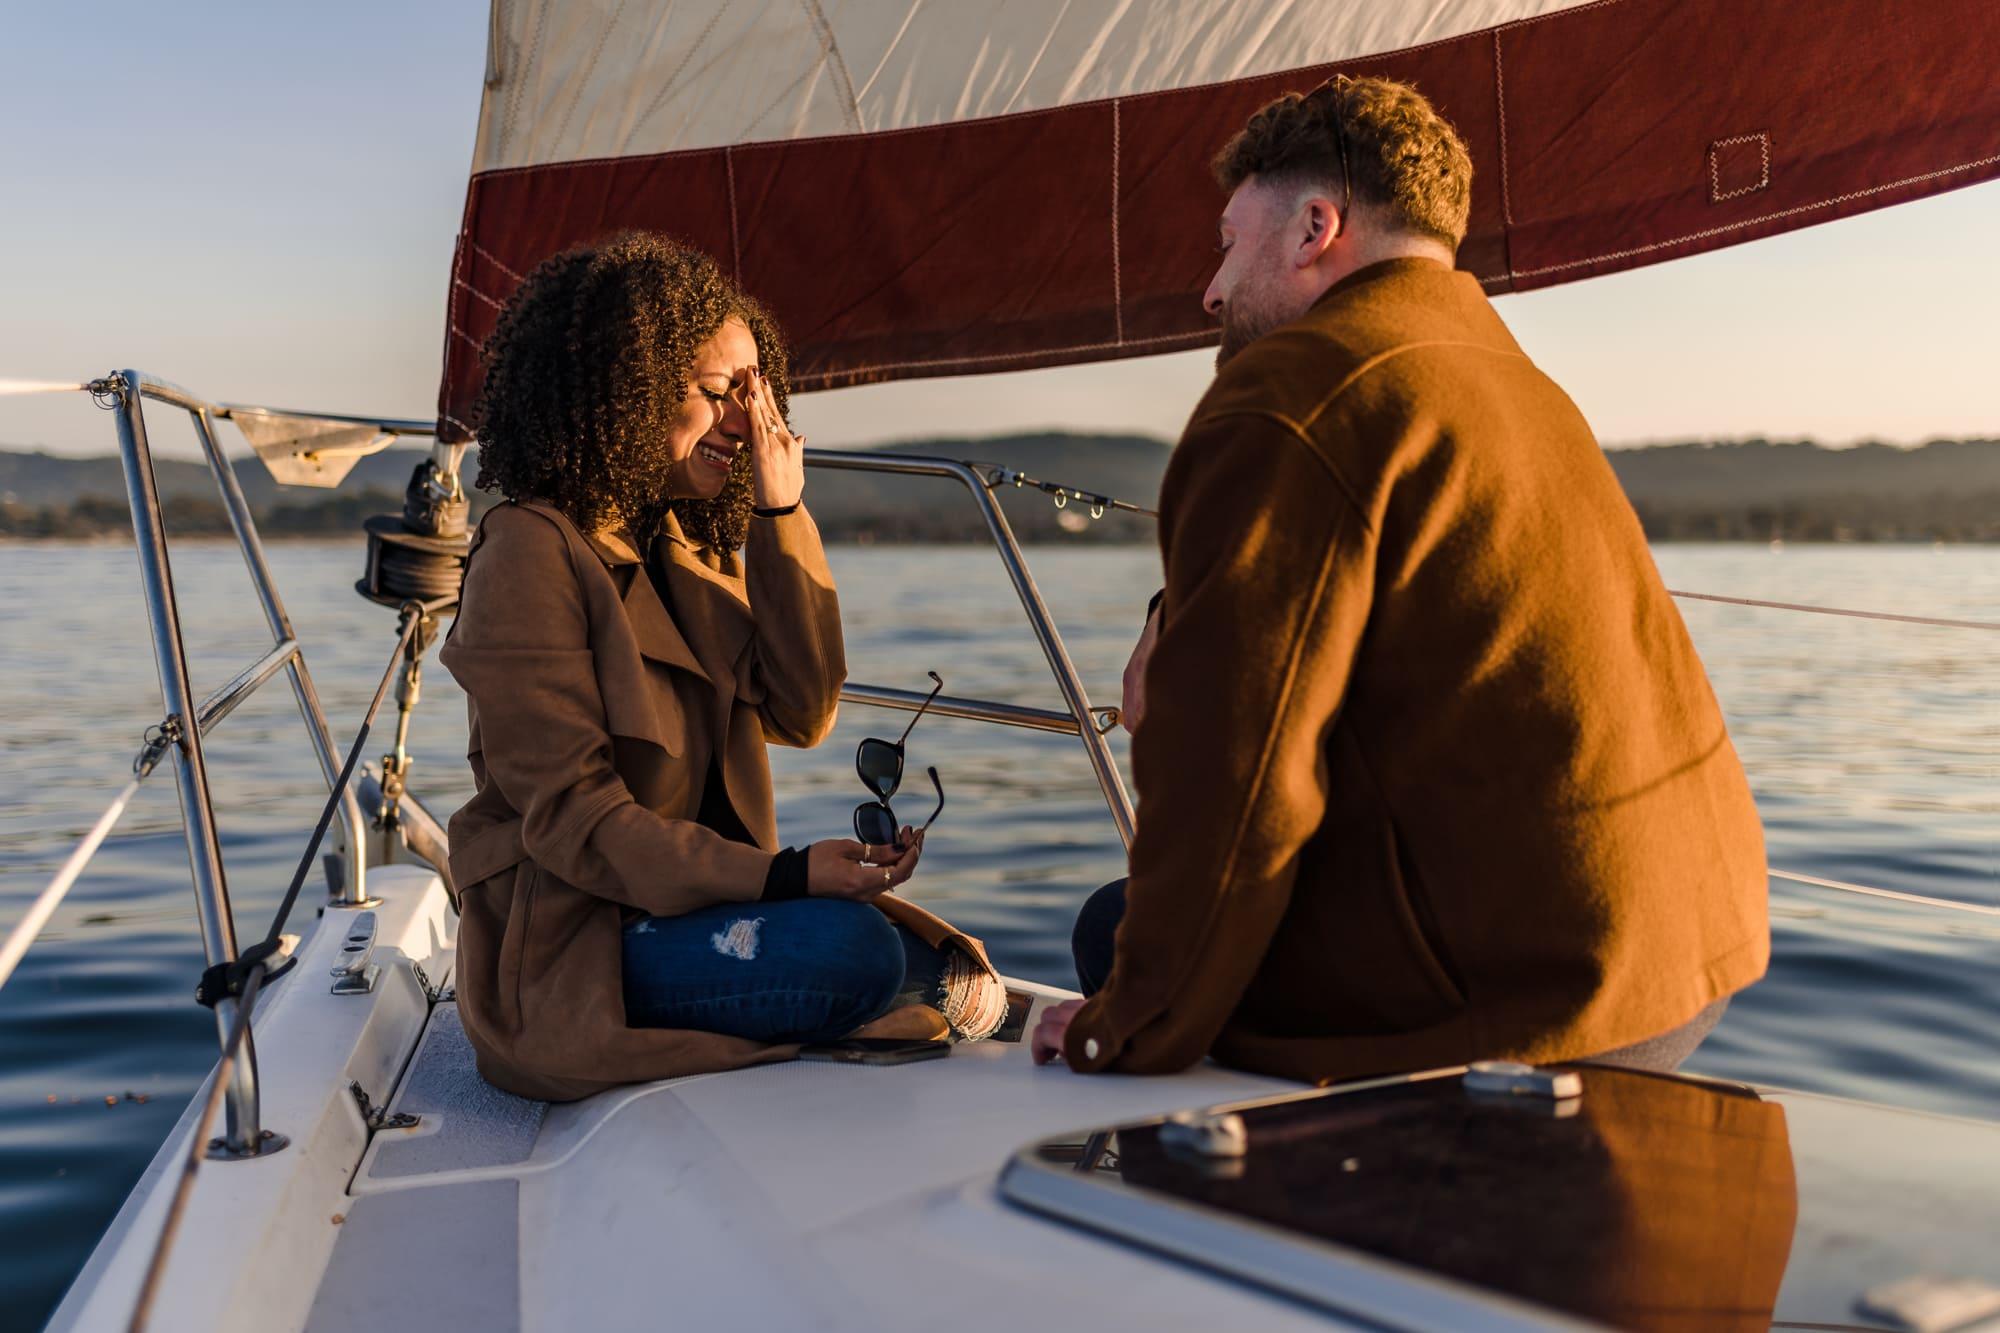 Sailboat engagement